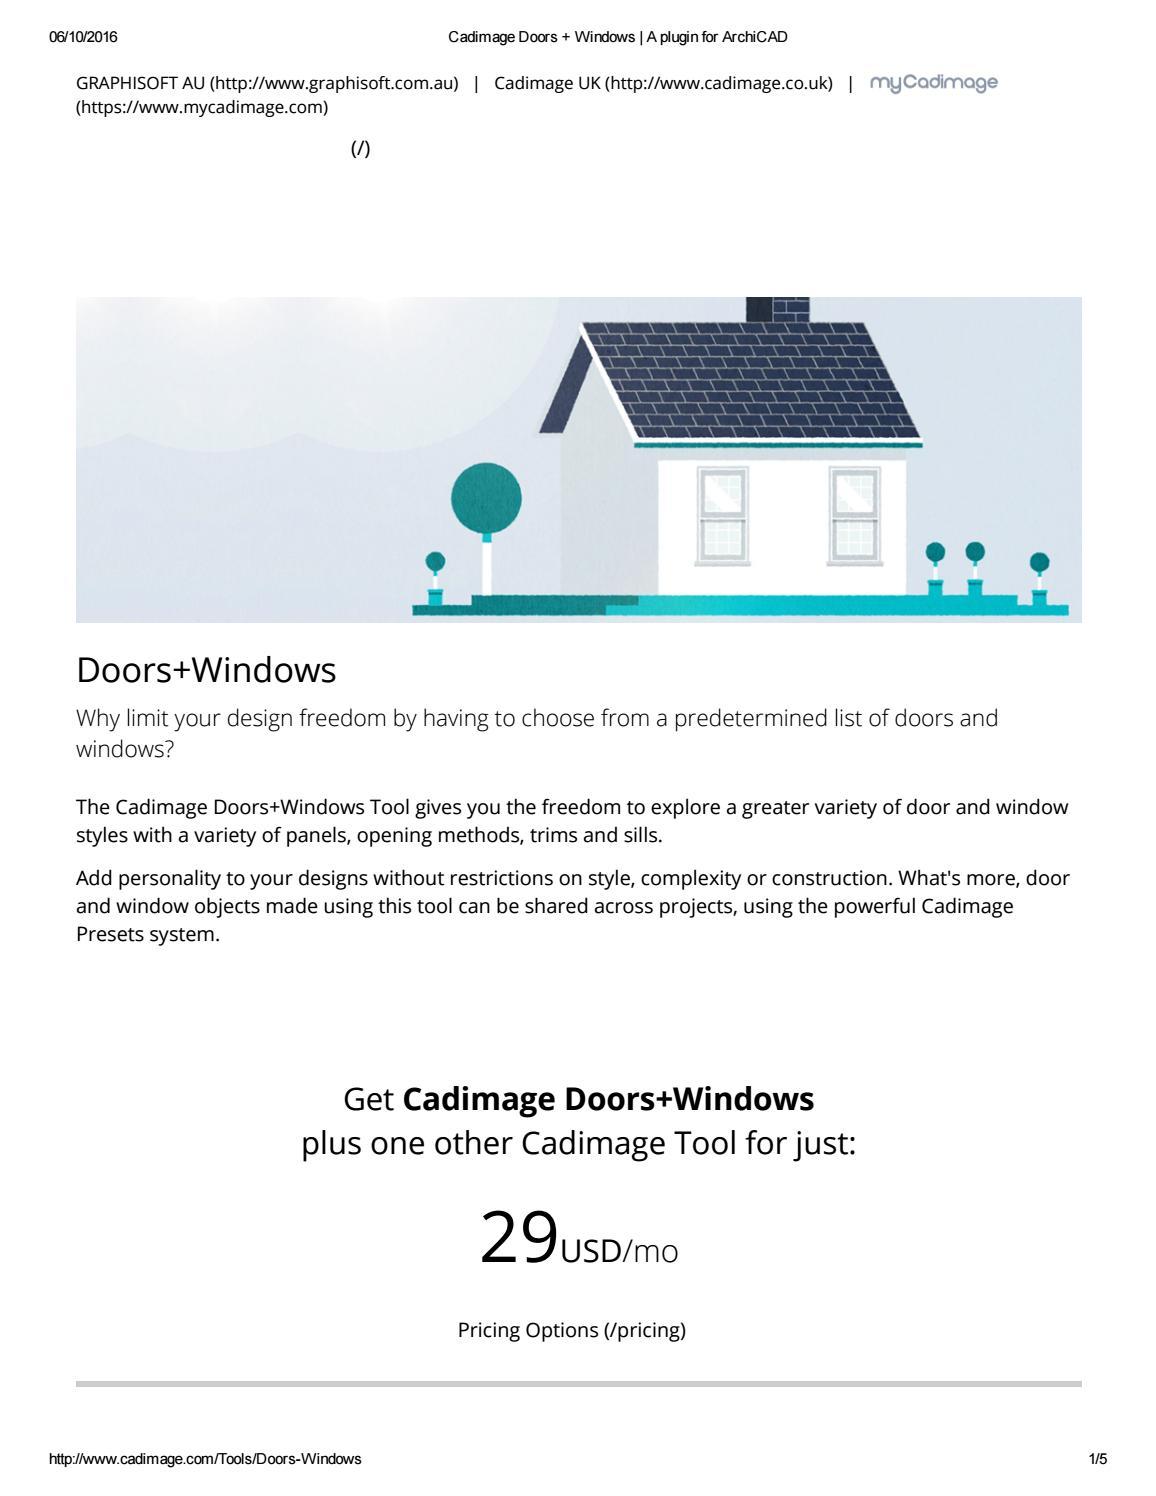 Cadimage doors windows a plugin for archicad by Cadimage Australia - issuu  sc 1 st  Issuu & Cadimage doors windows a plugin for archicad by Cadimage Australia ...